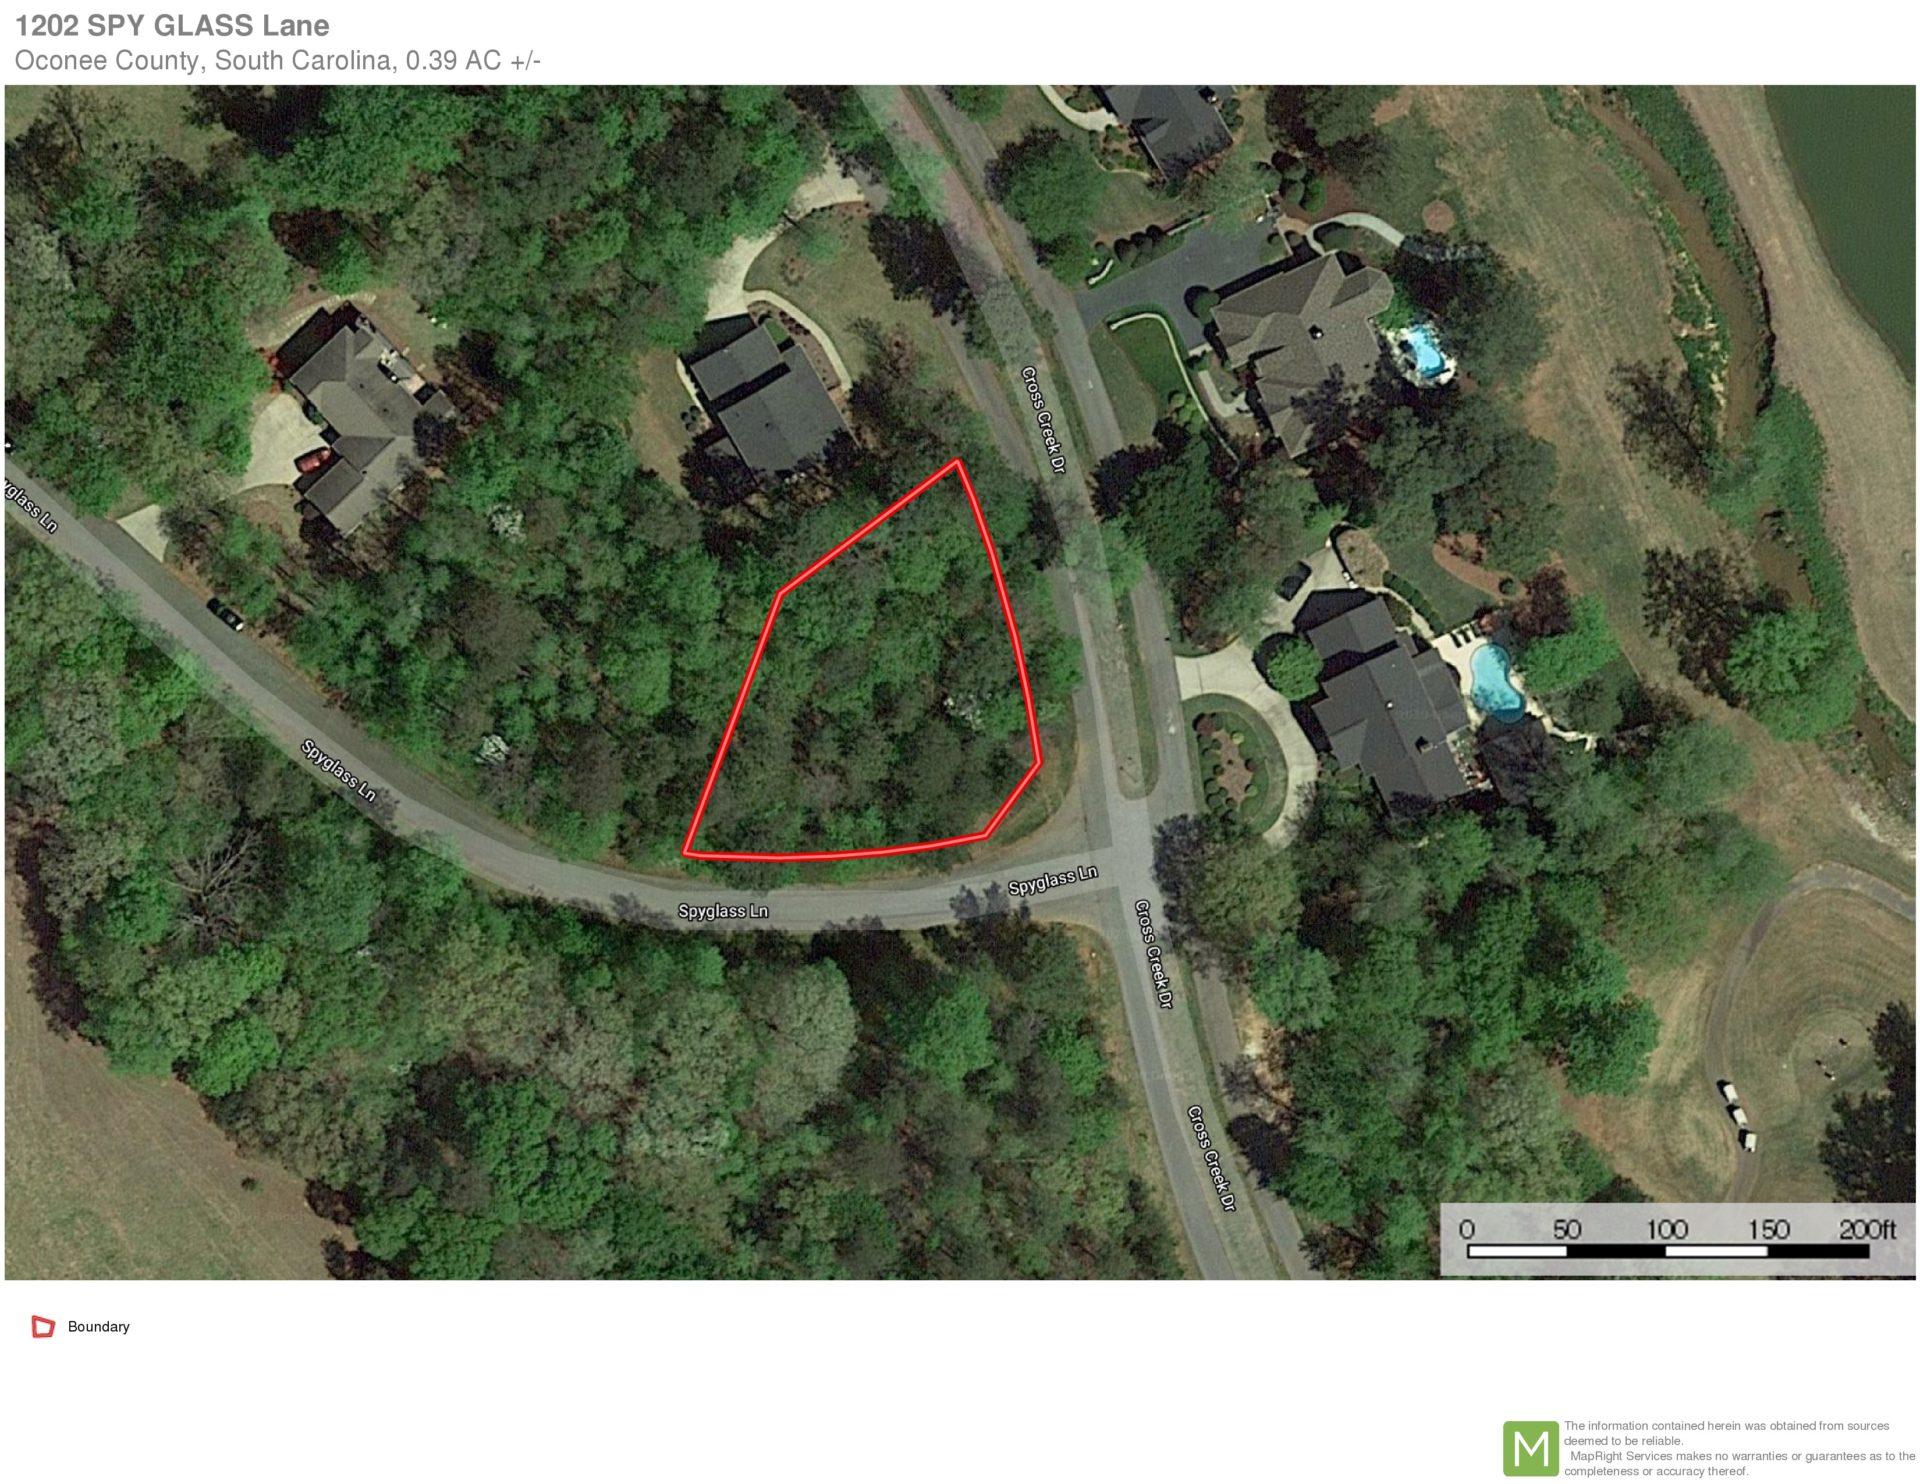 +/-.39-Acres-Residential Lot in Cross Creek Plantation*